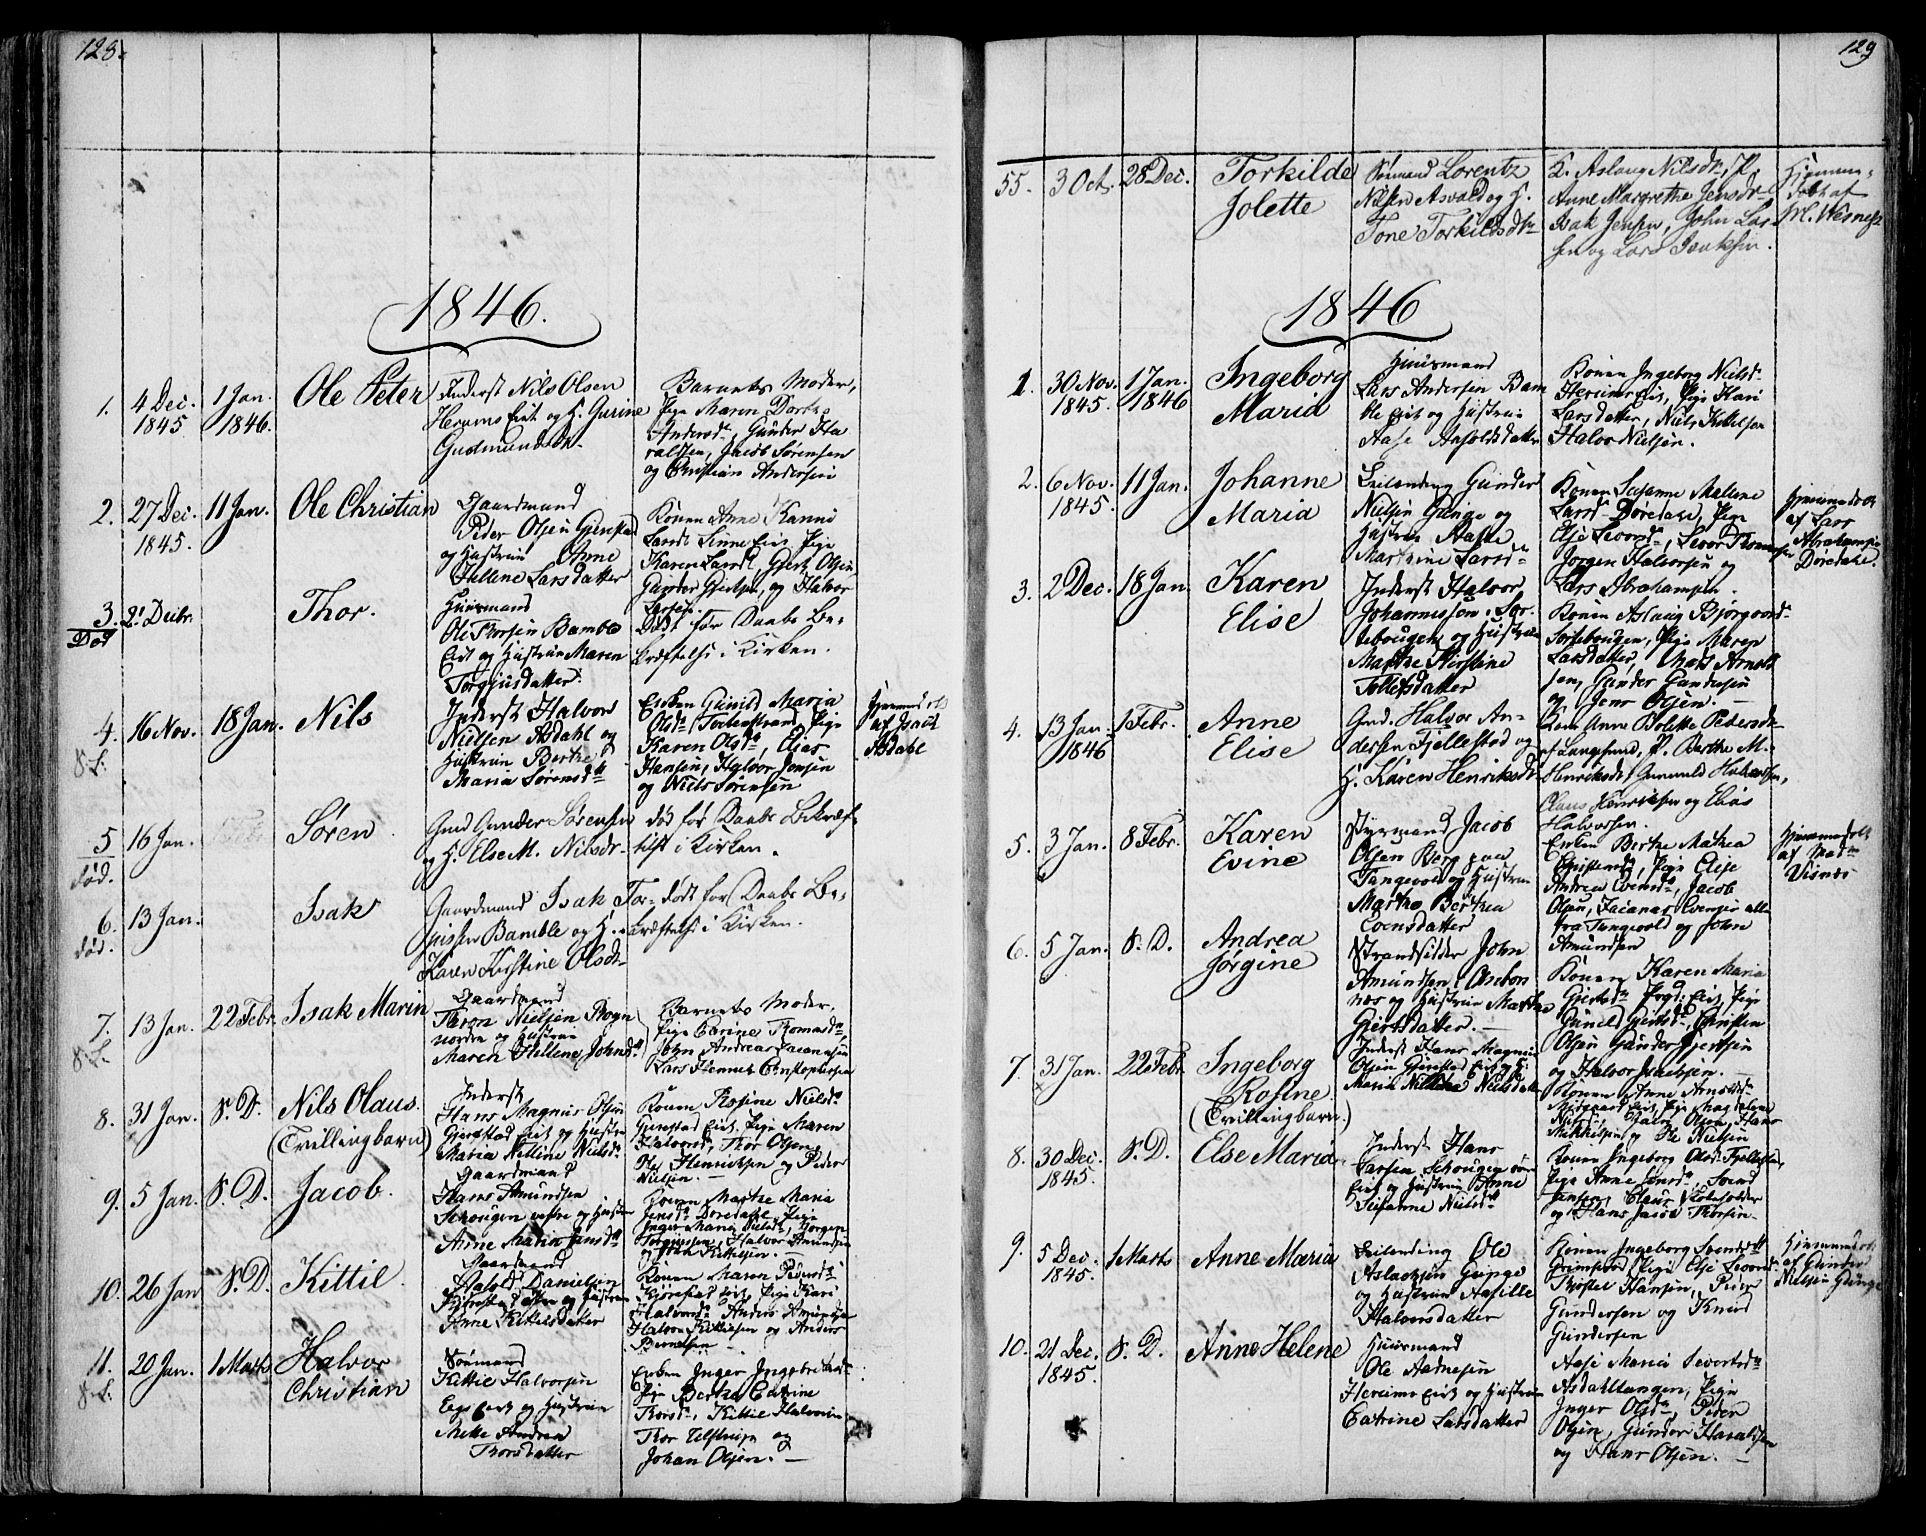 SAKO, Bamble kirkebøker, F/Fa/L0004: Ministerialbok nr. I 4, 1834-1853, s. 128-129